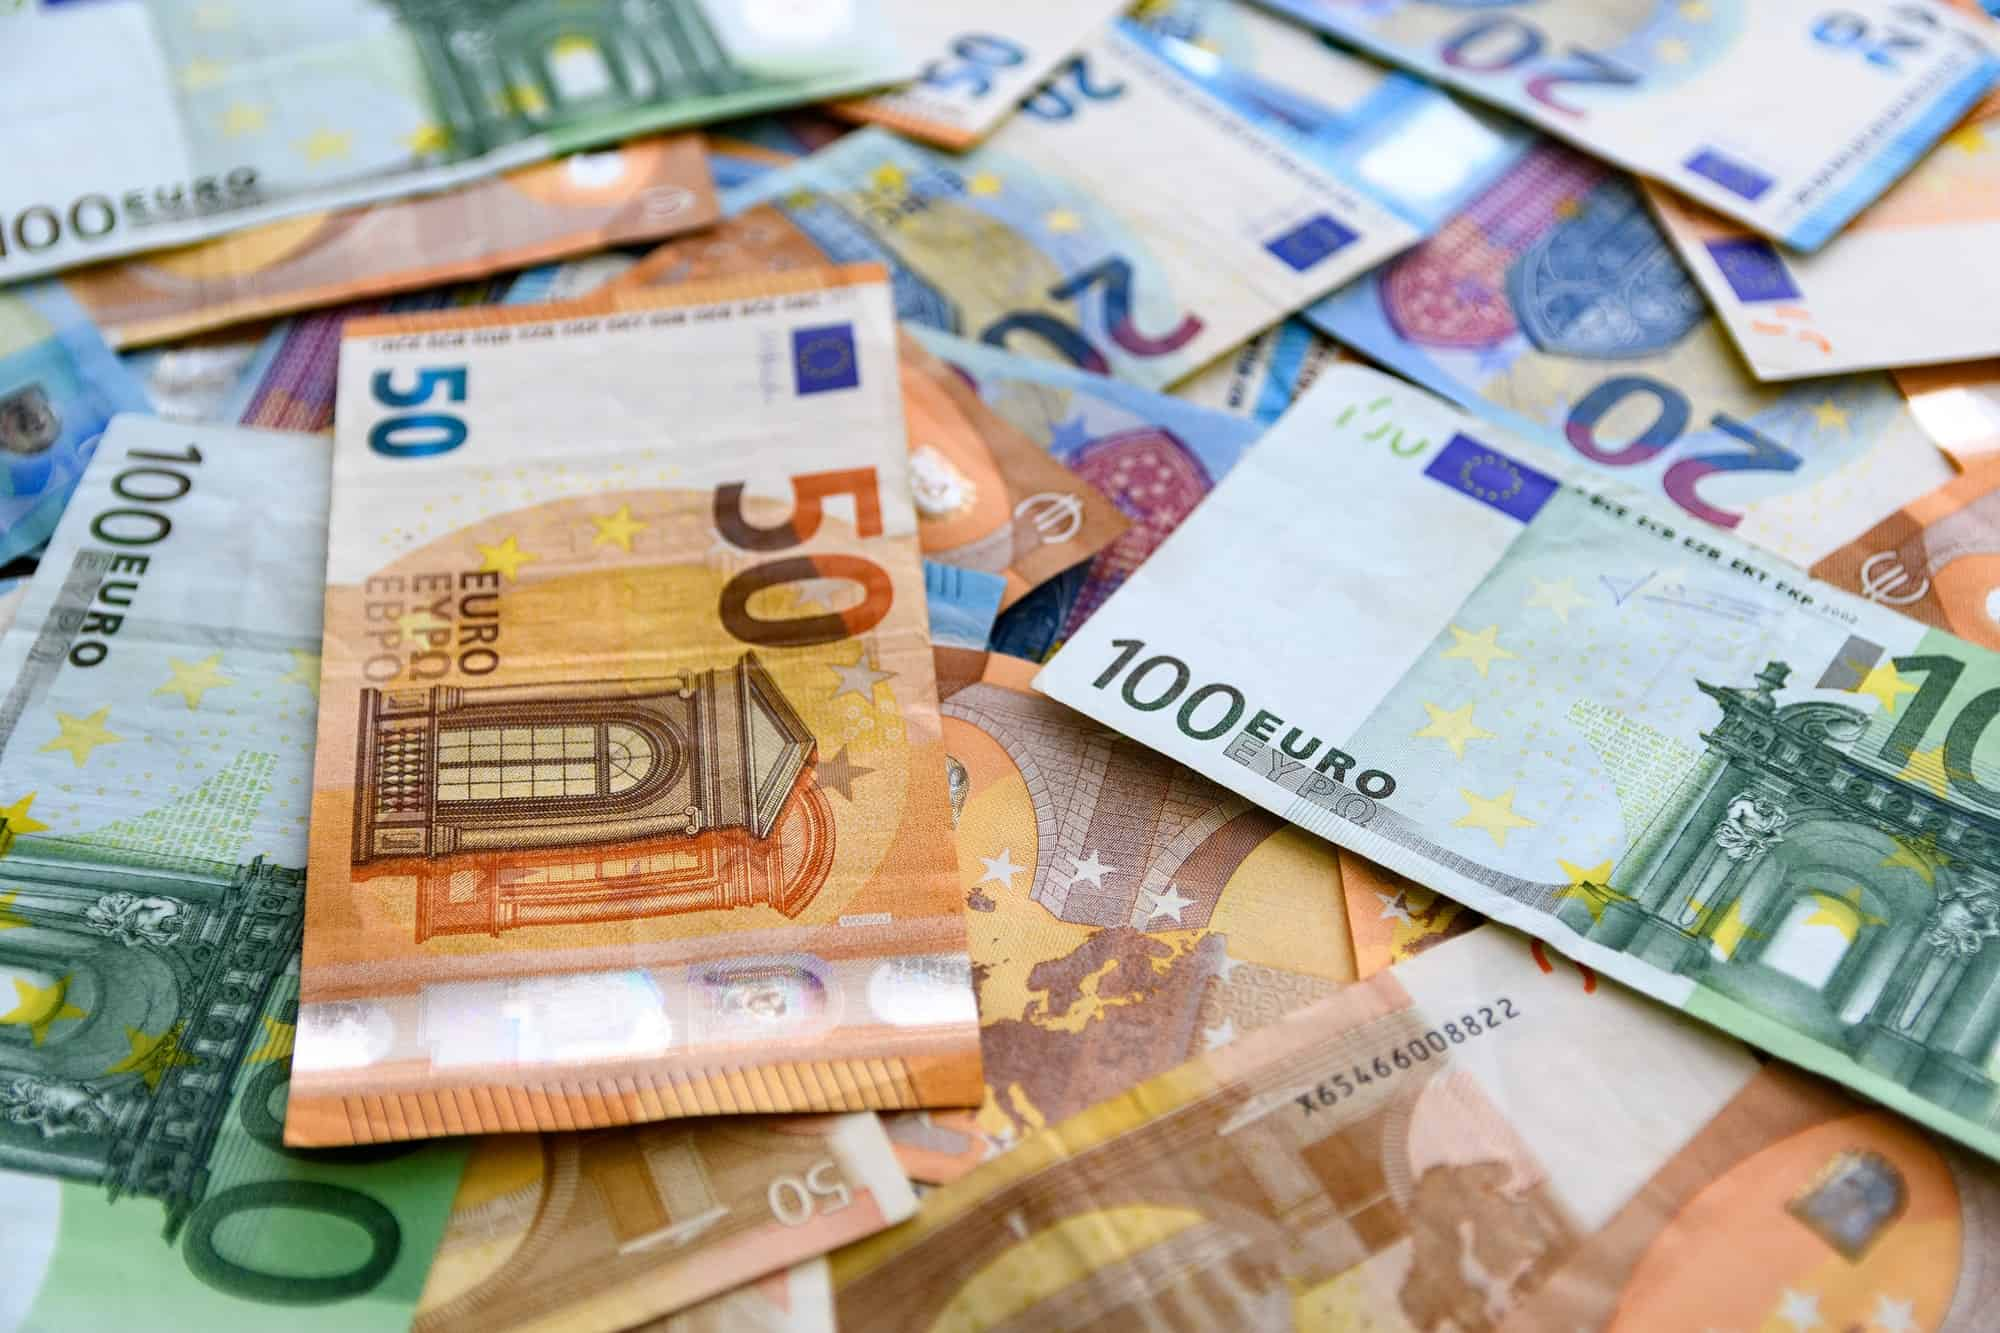 Close-up image of euro bills. Background, money, cash, texture, full frame.